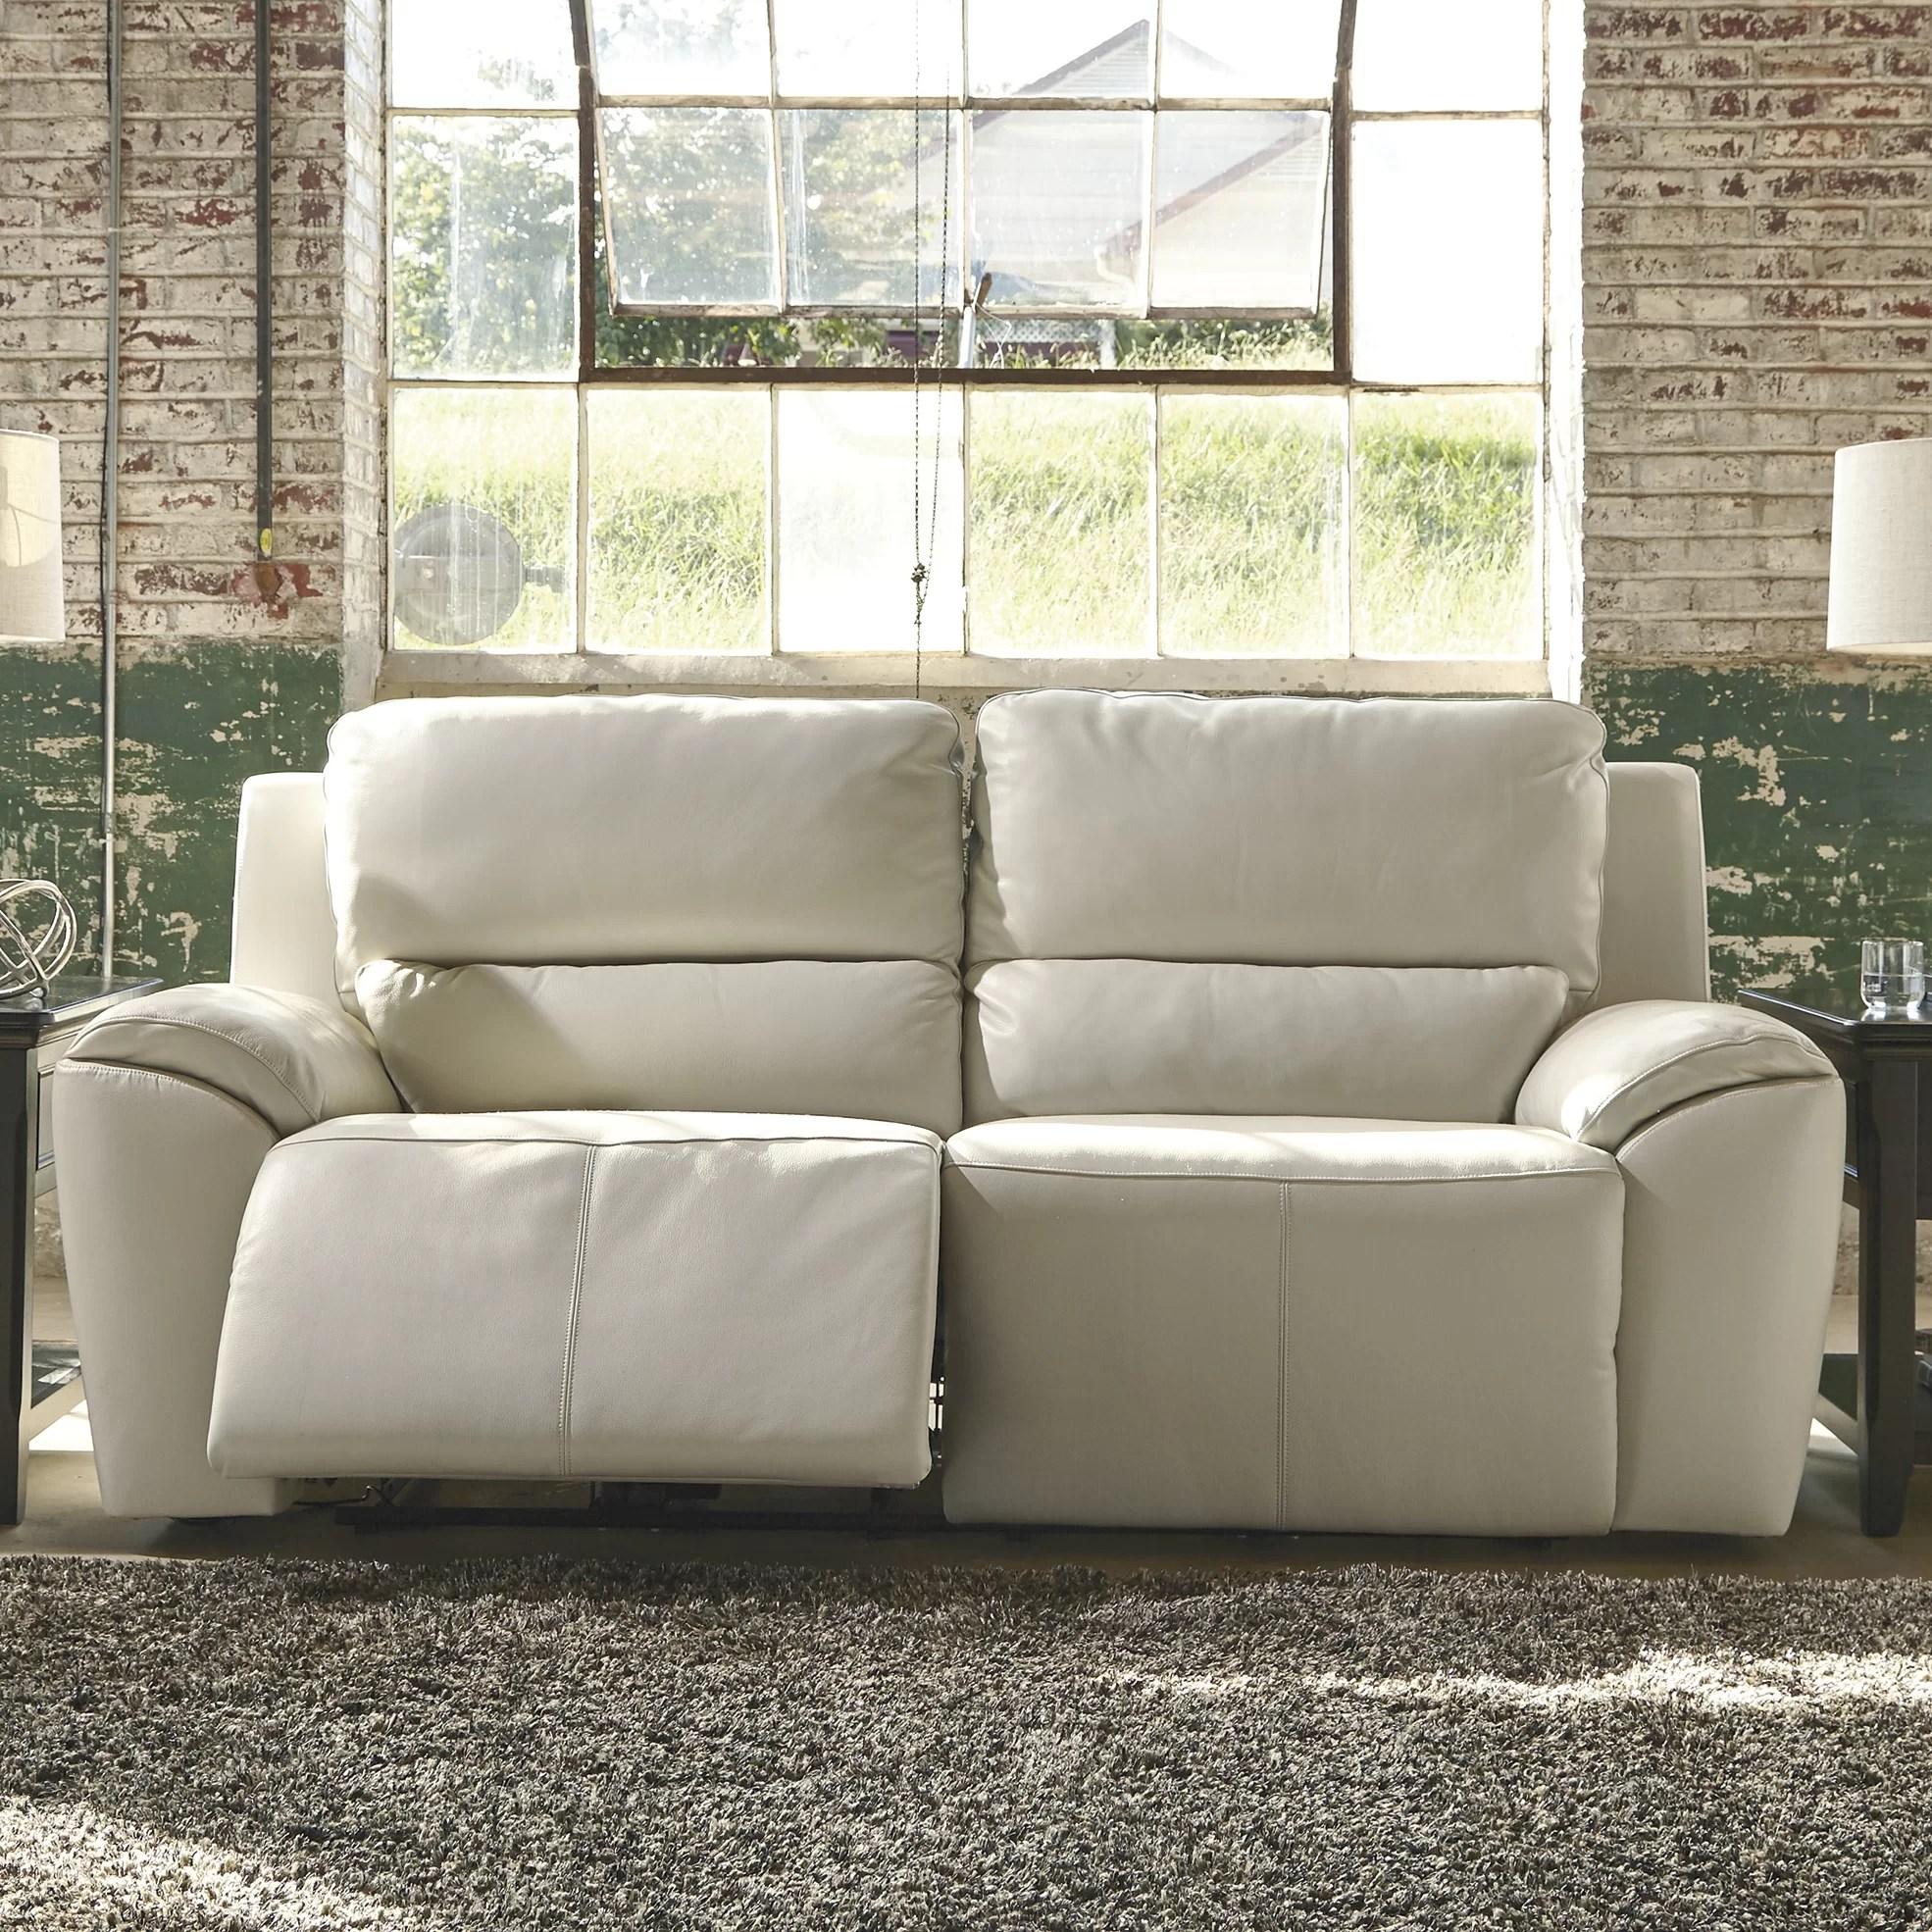 signature design by ashley harvest sleeper sofa flexsteel westport power reclining 2 seat wayfair